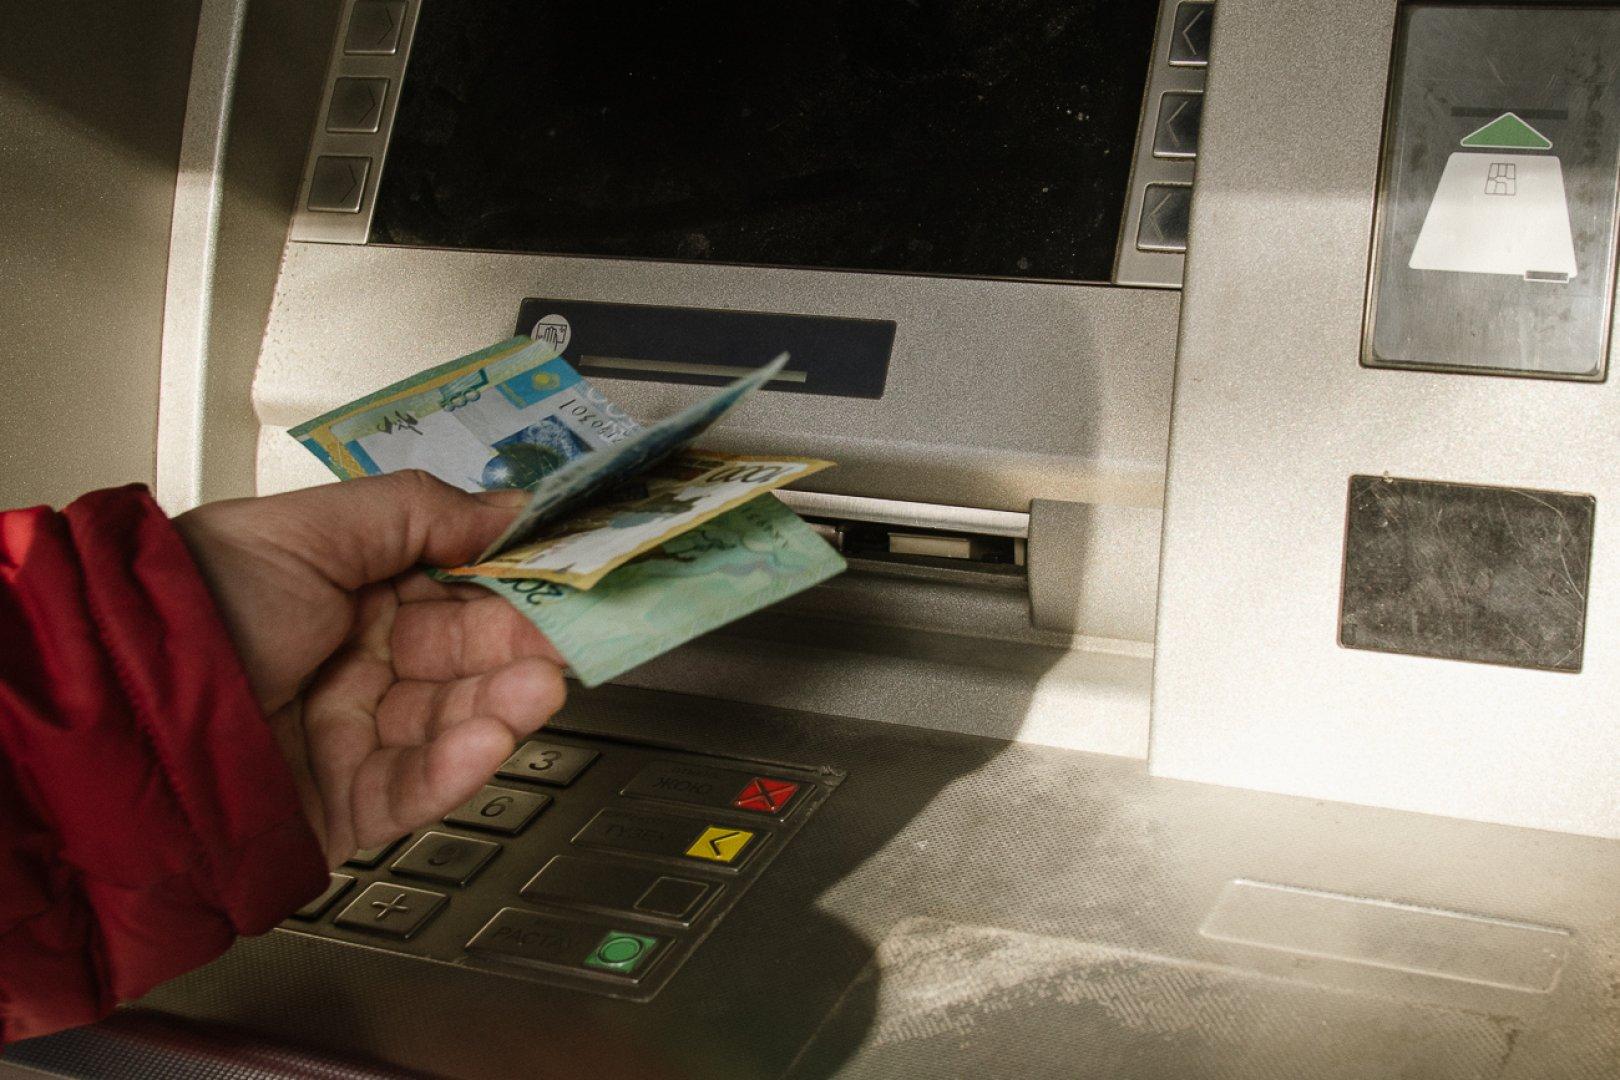 банкомат карточка